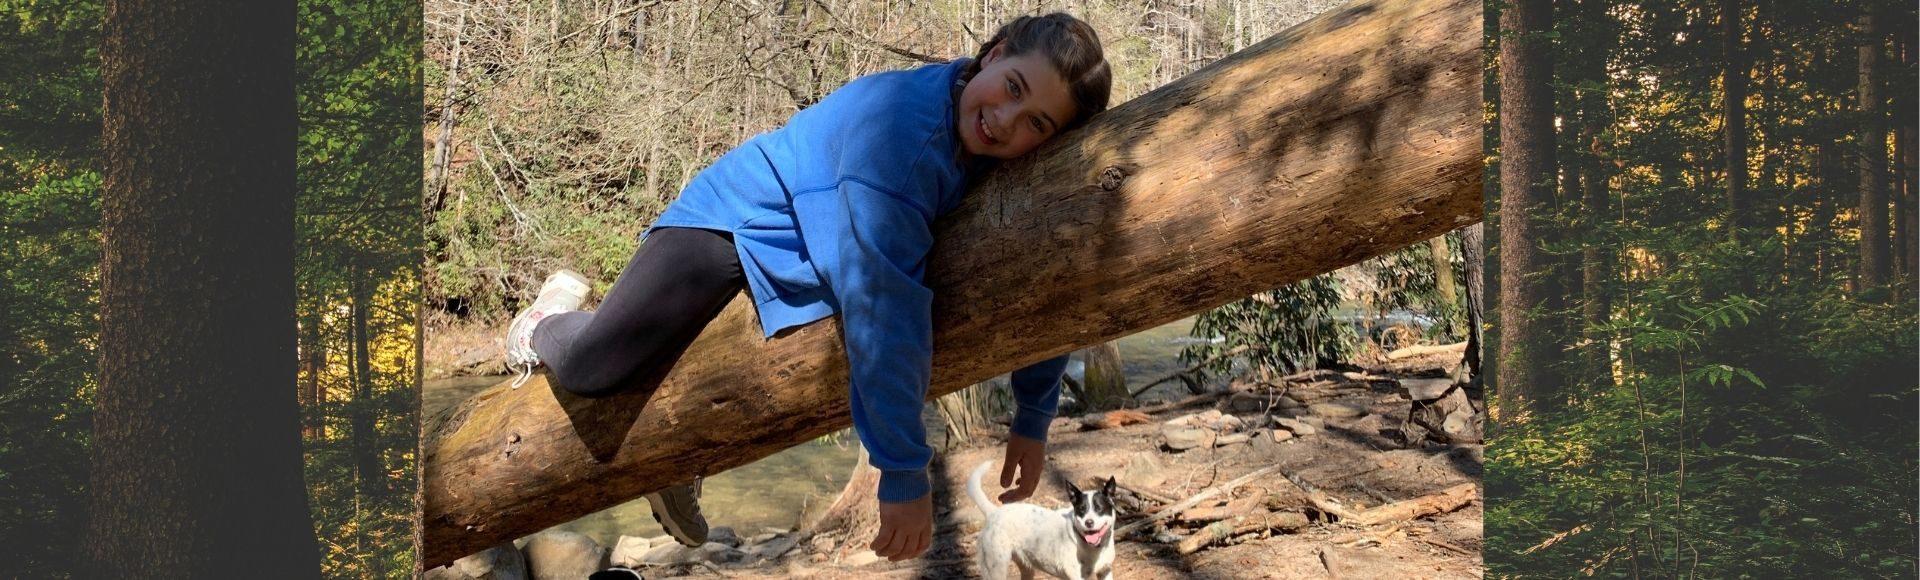 photo of girl on a log and dog